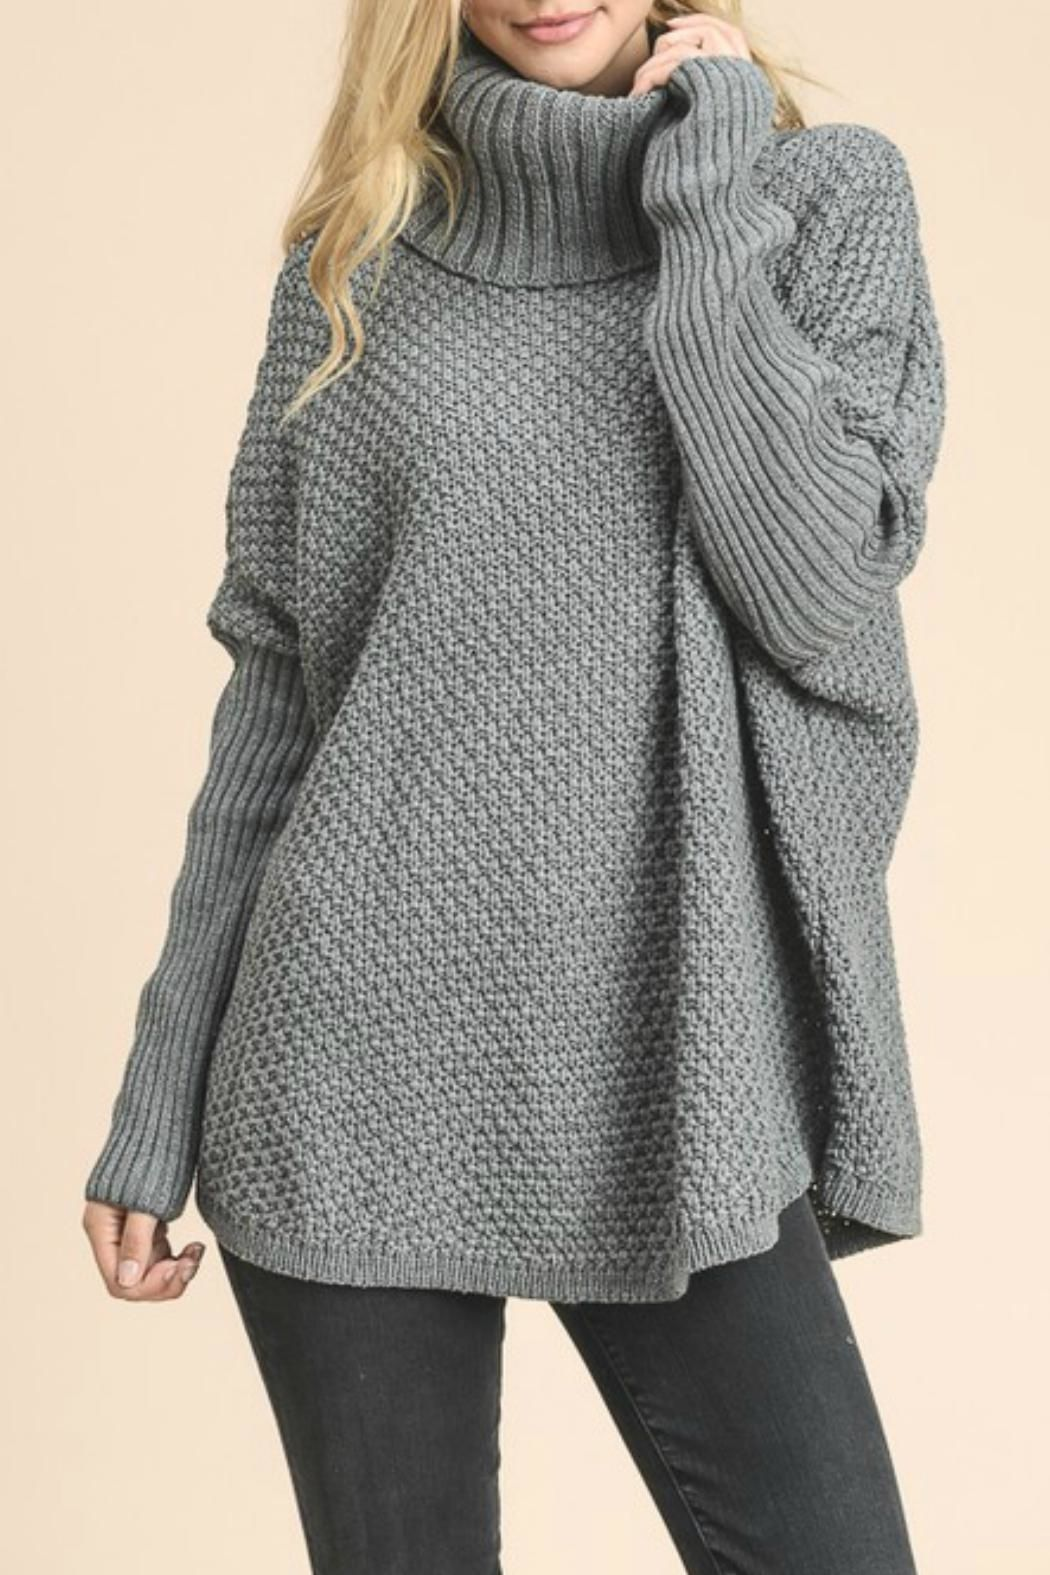 Doe   Rae Gray Chunky Oversized Sweater   Tops   Pinterest ...